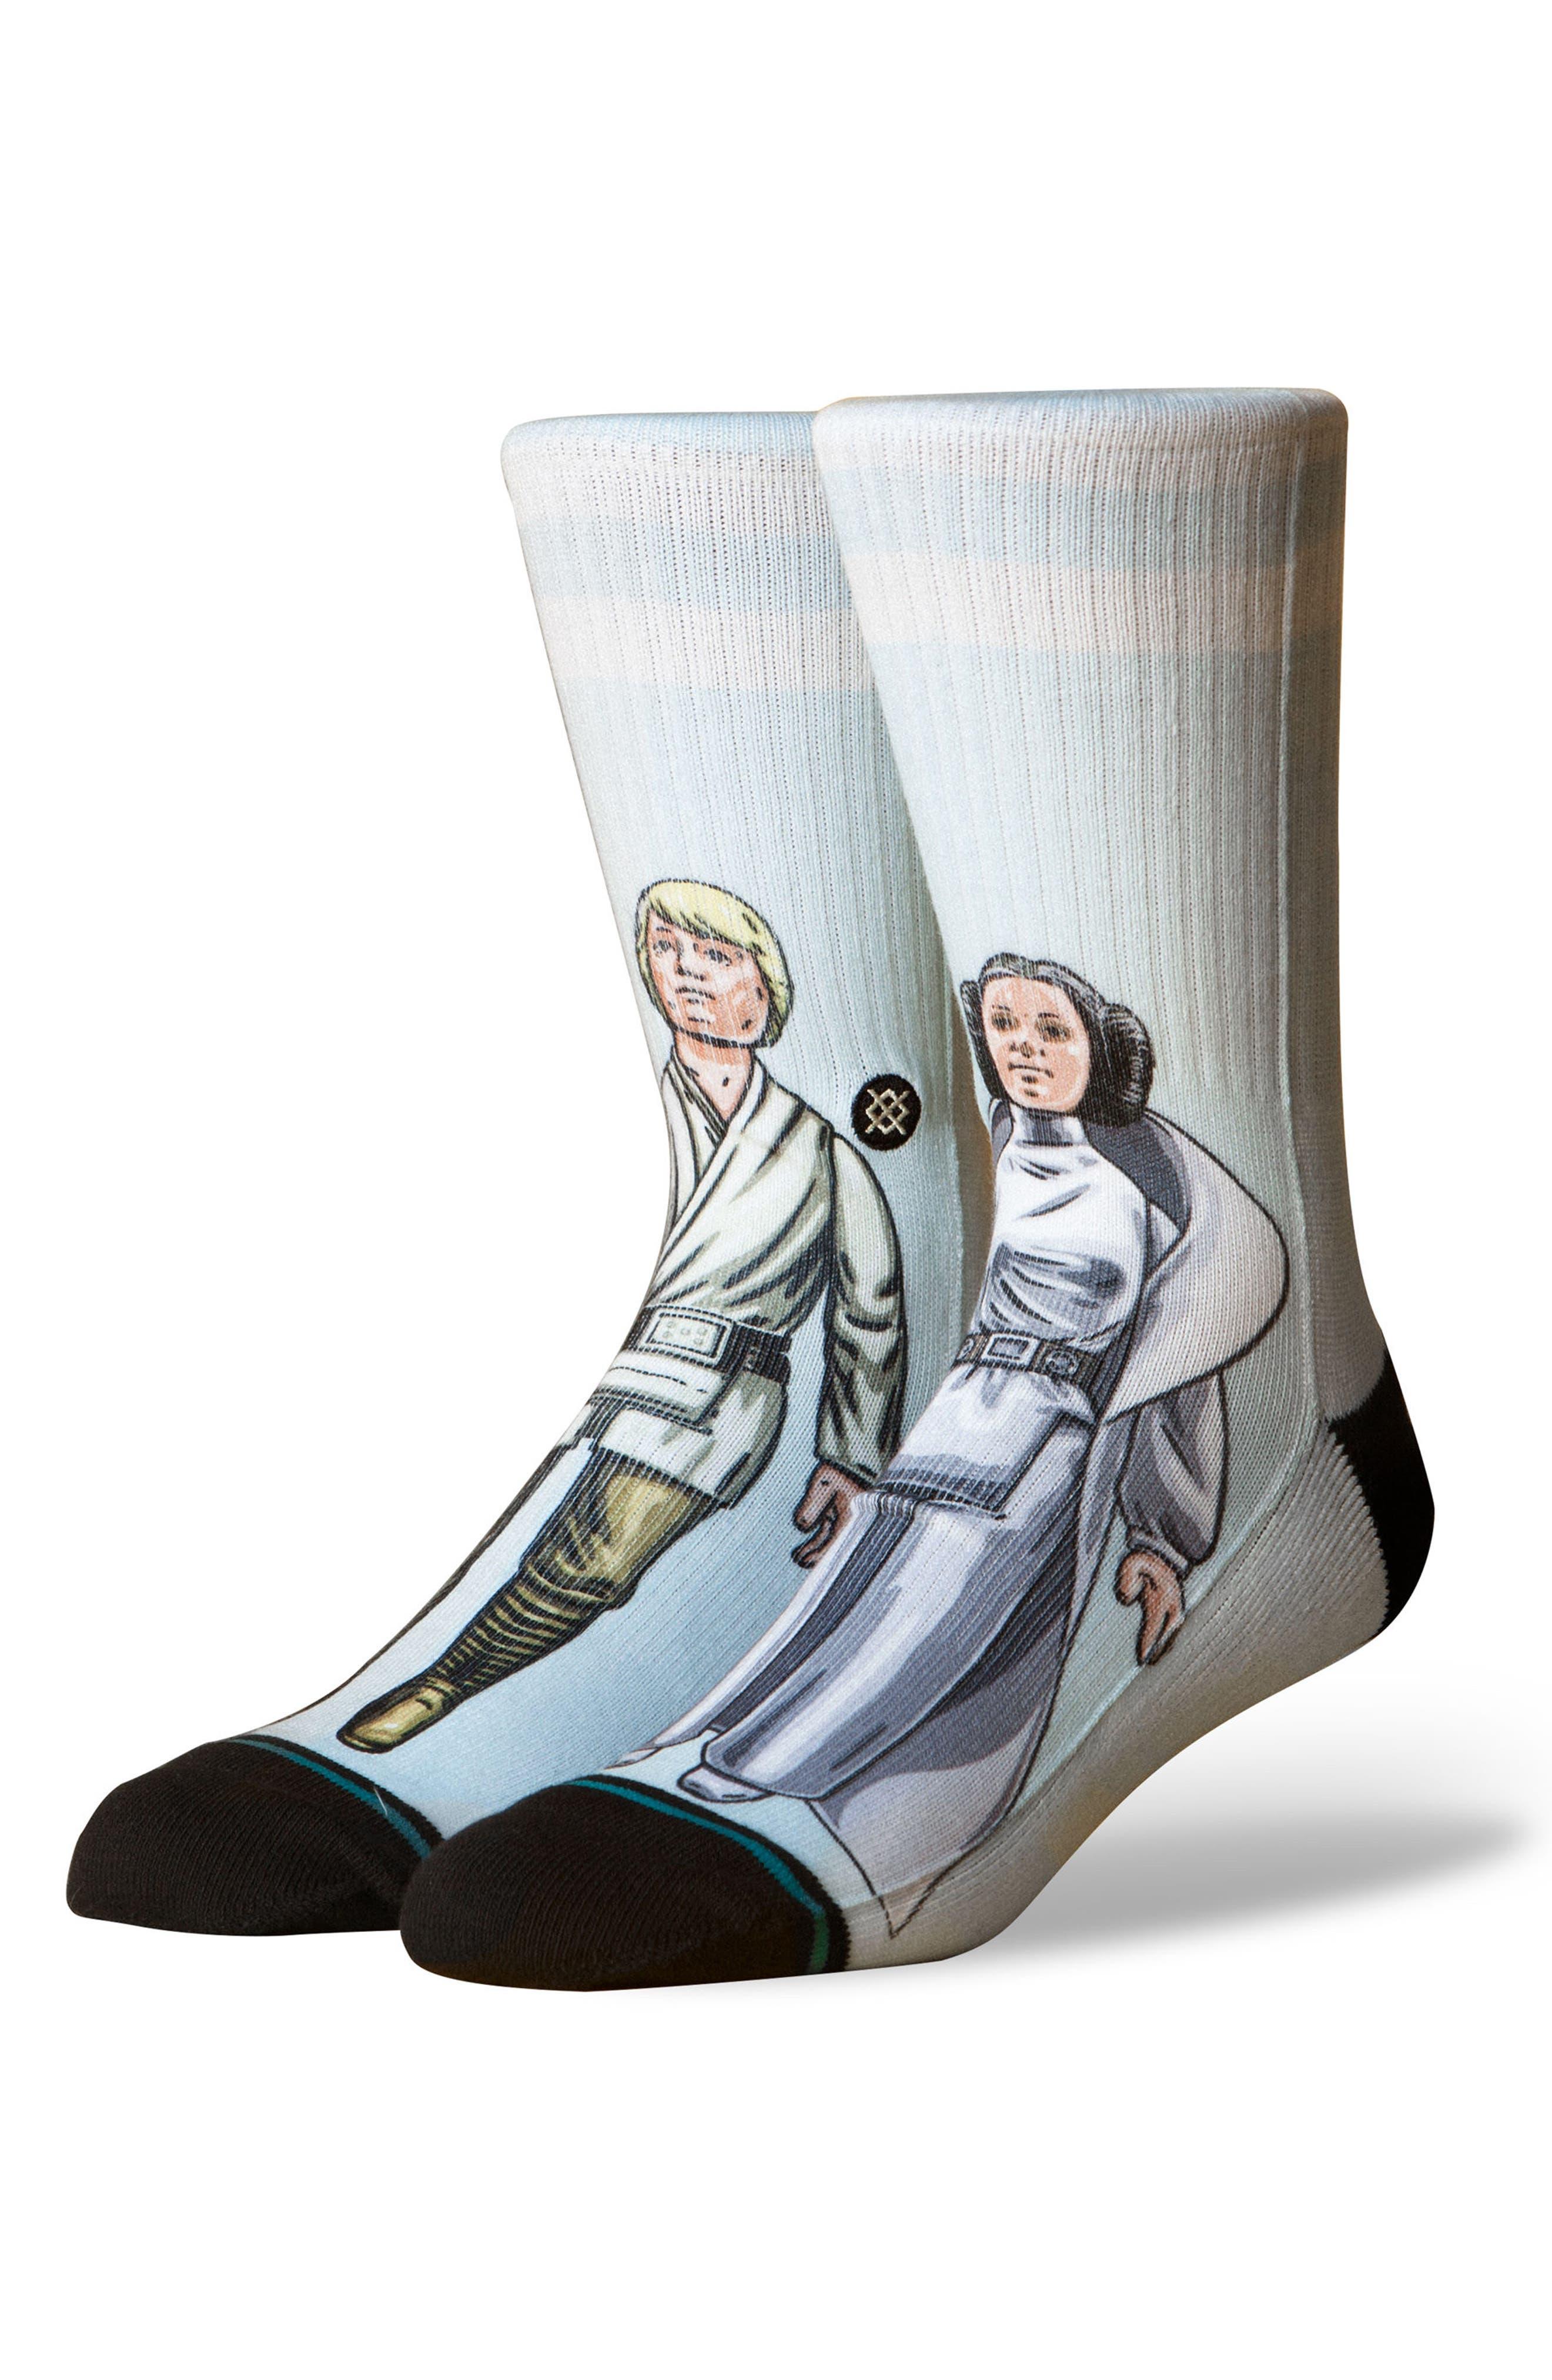 Main Image - Stance Star Wars™ Family Force Socks